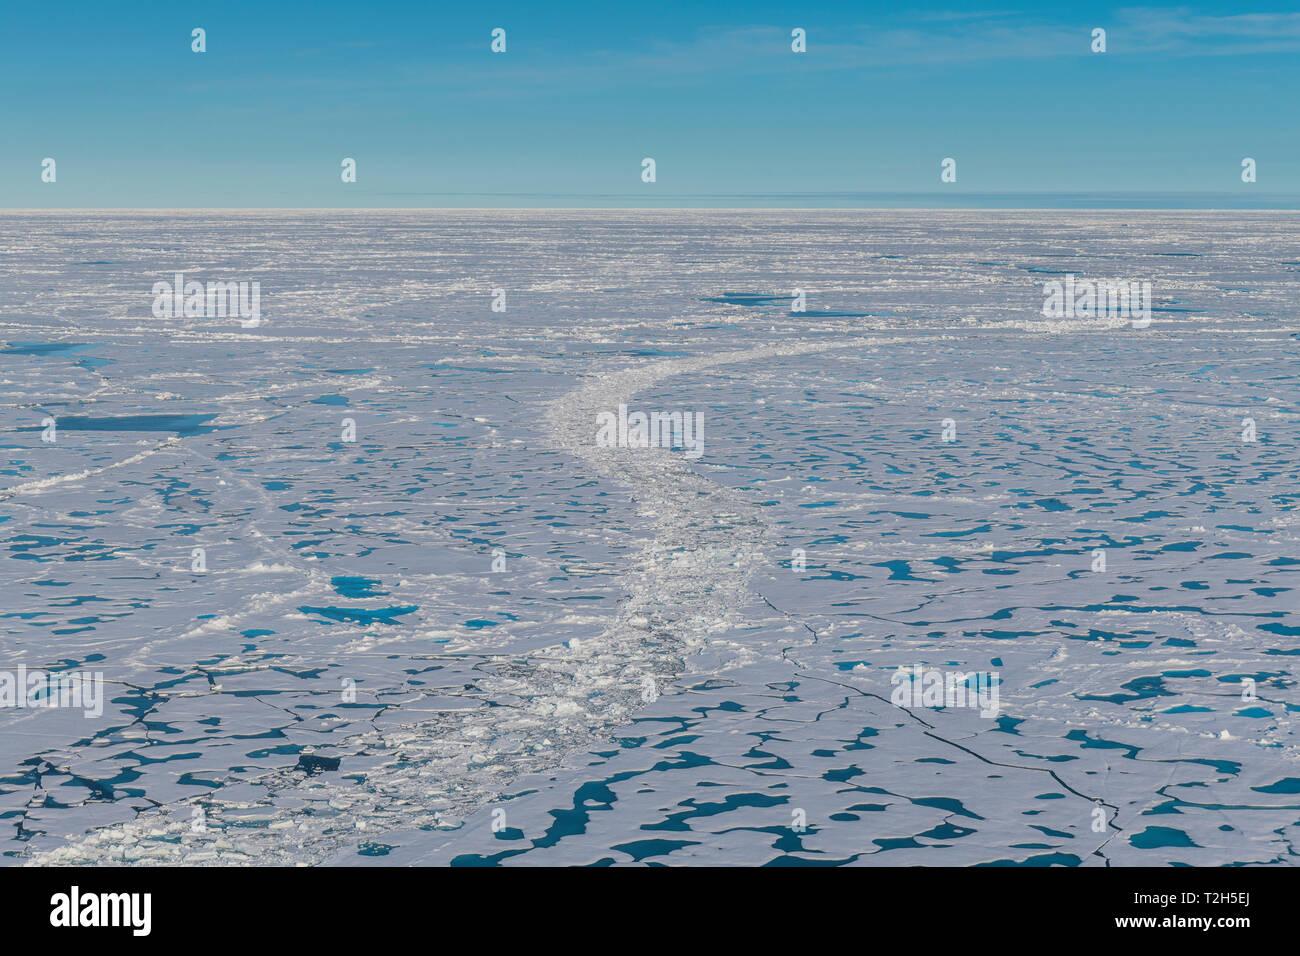 Melting ice at North Pole, Arctic - Stock Image